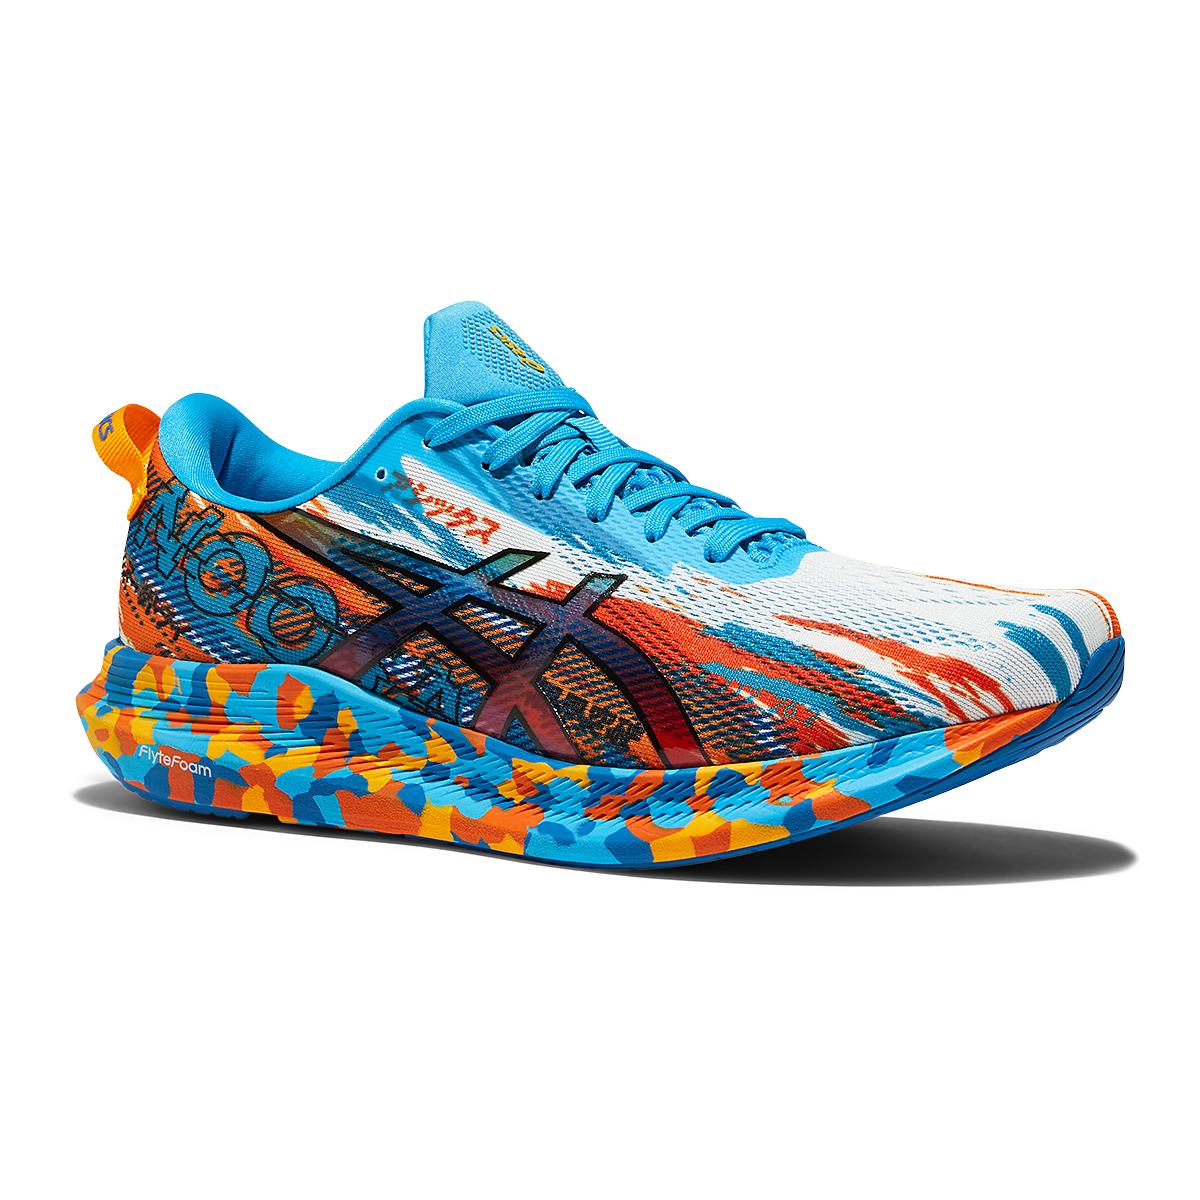 Men's Asics Noosa Tri 13 Running Shoe - Color: Digital Aqua/Ma - Size: 7 - Width: Regular, Digital Aqua/Ma, large, image 3